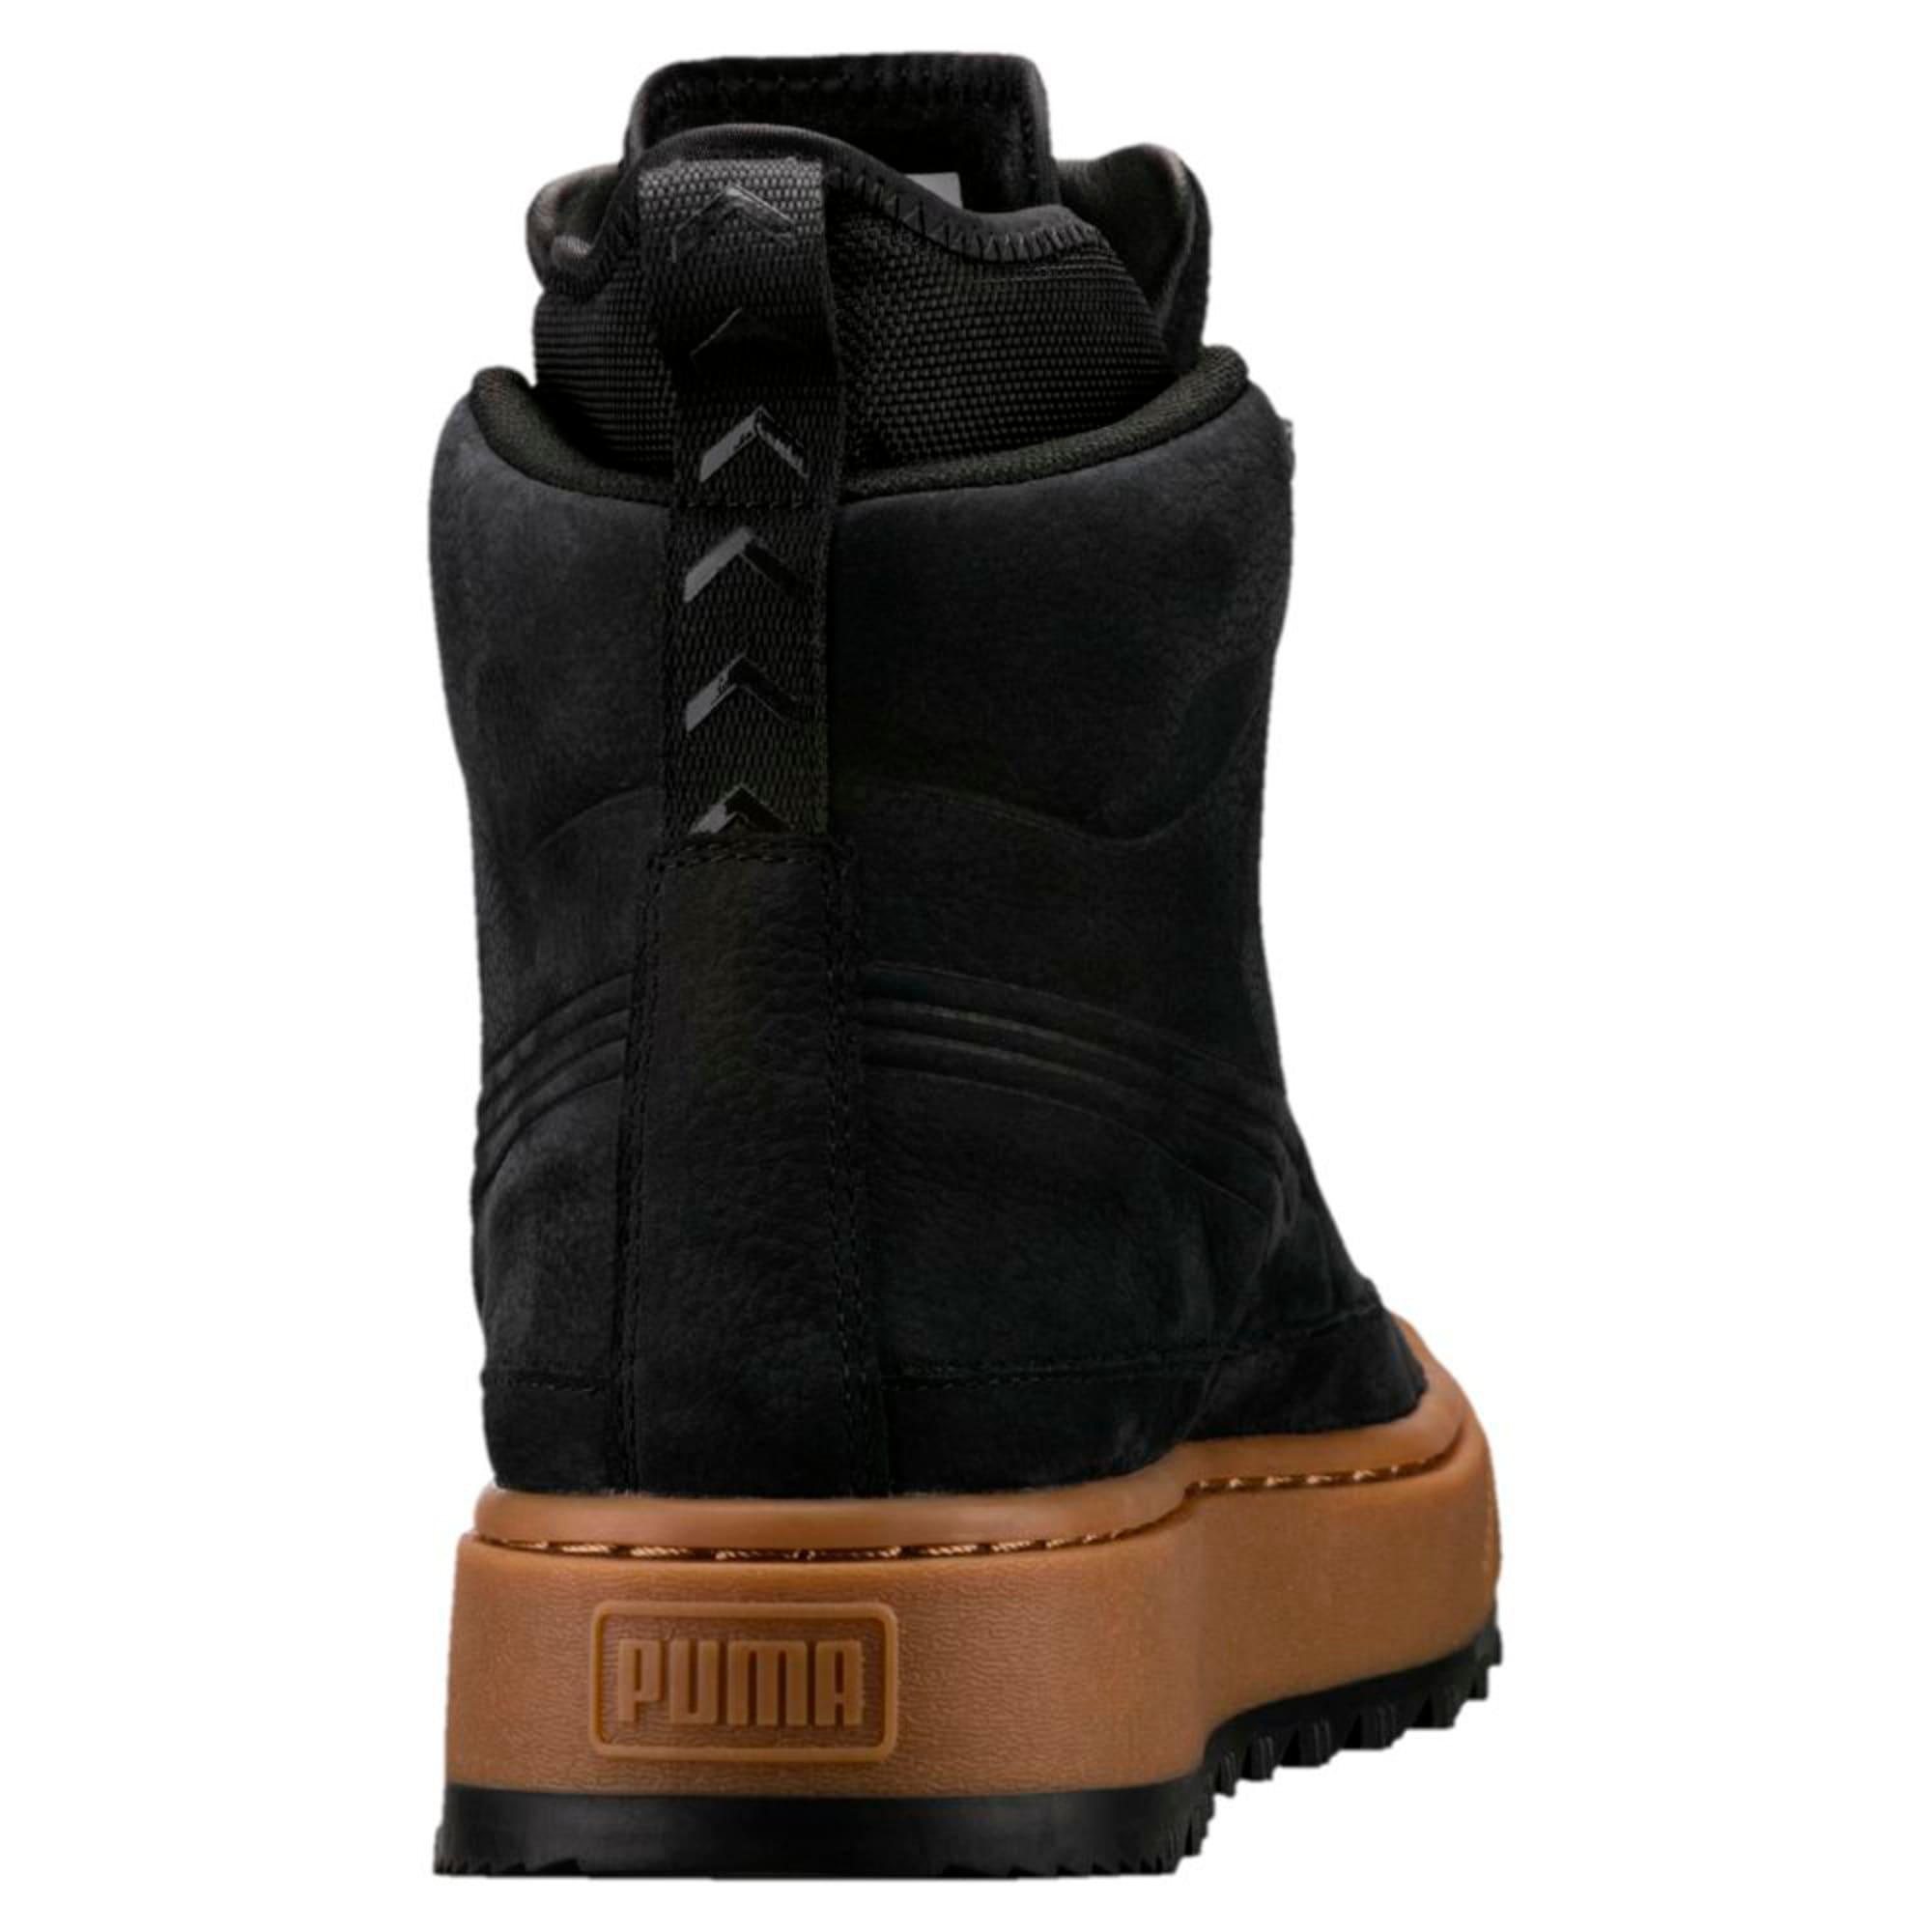 Thumbnail 4 of The Ren Boots, Puma Black, medium-IND